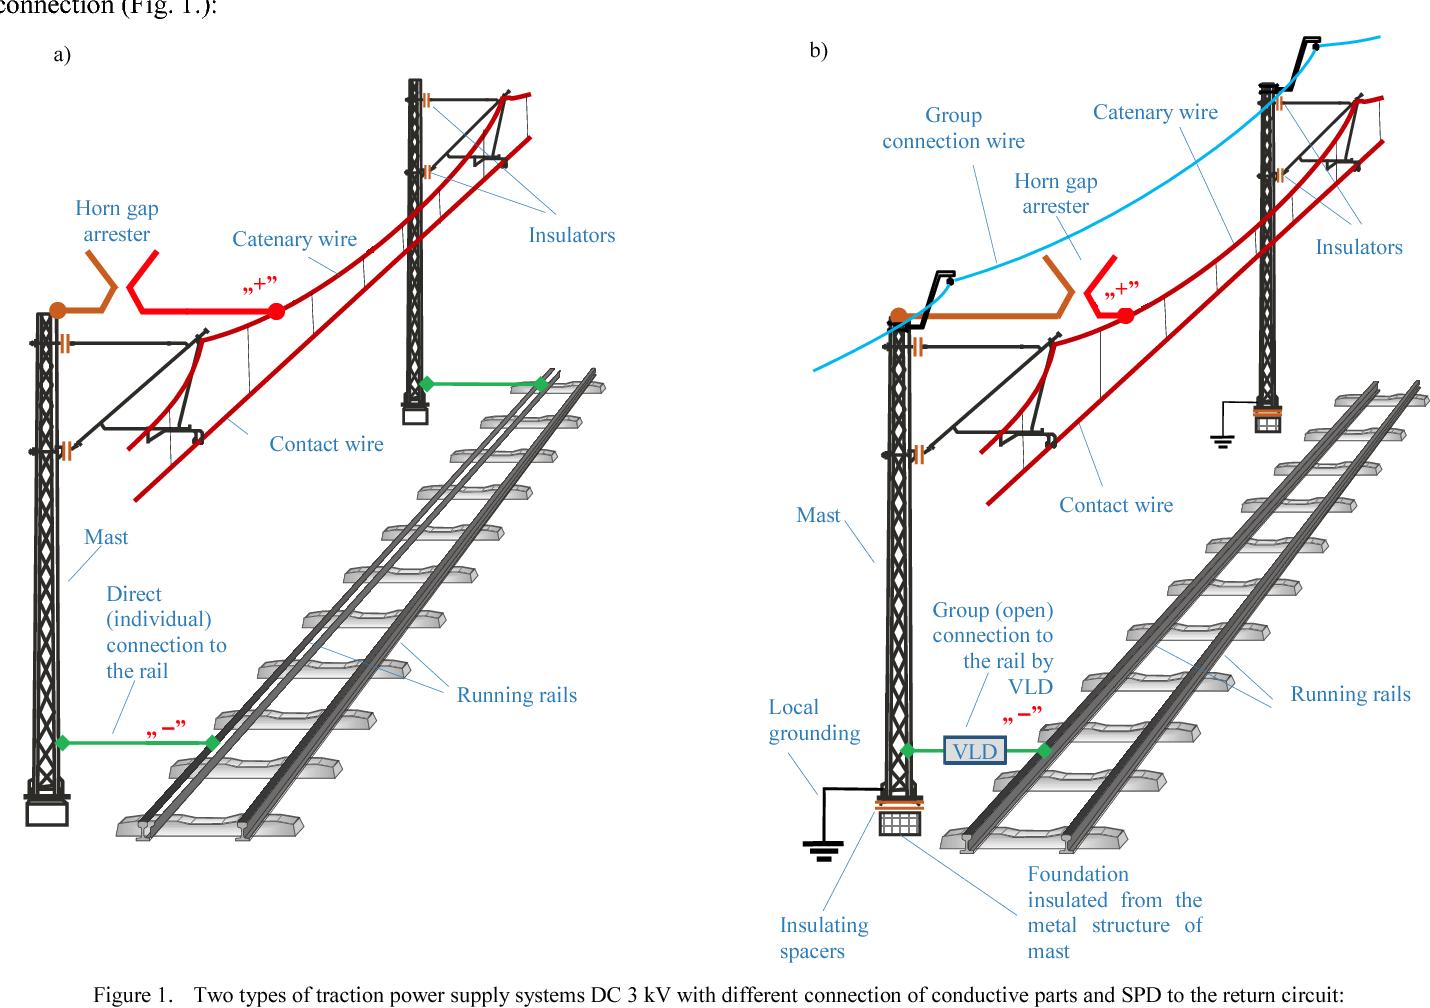 Coordination Of Surge Arresters In Dc 3 Kv Railway Traction System Figure 9 Generator Field Wiring Diagram Tests Semantic Scholar